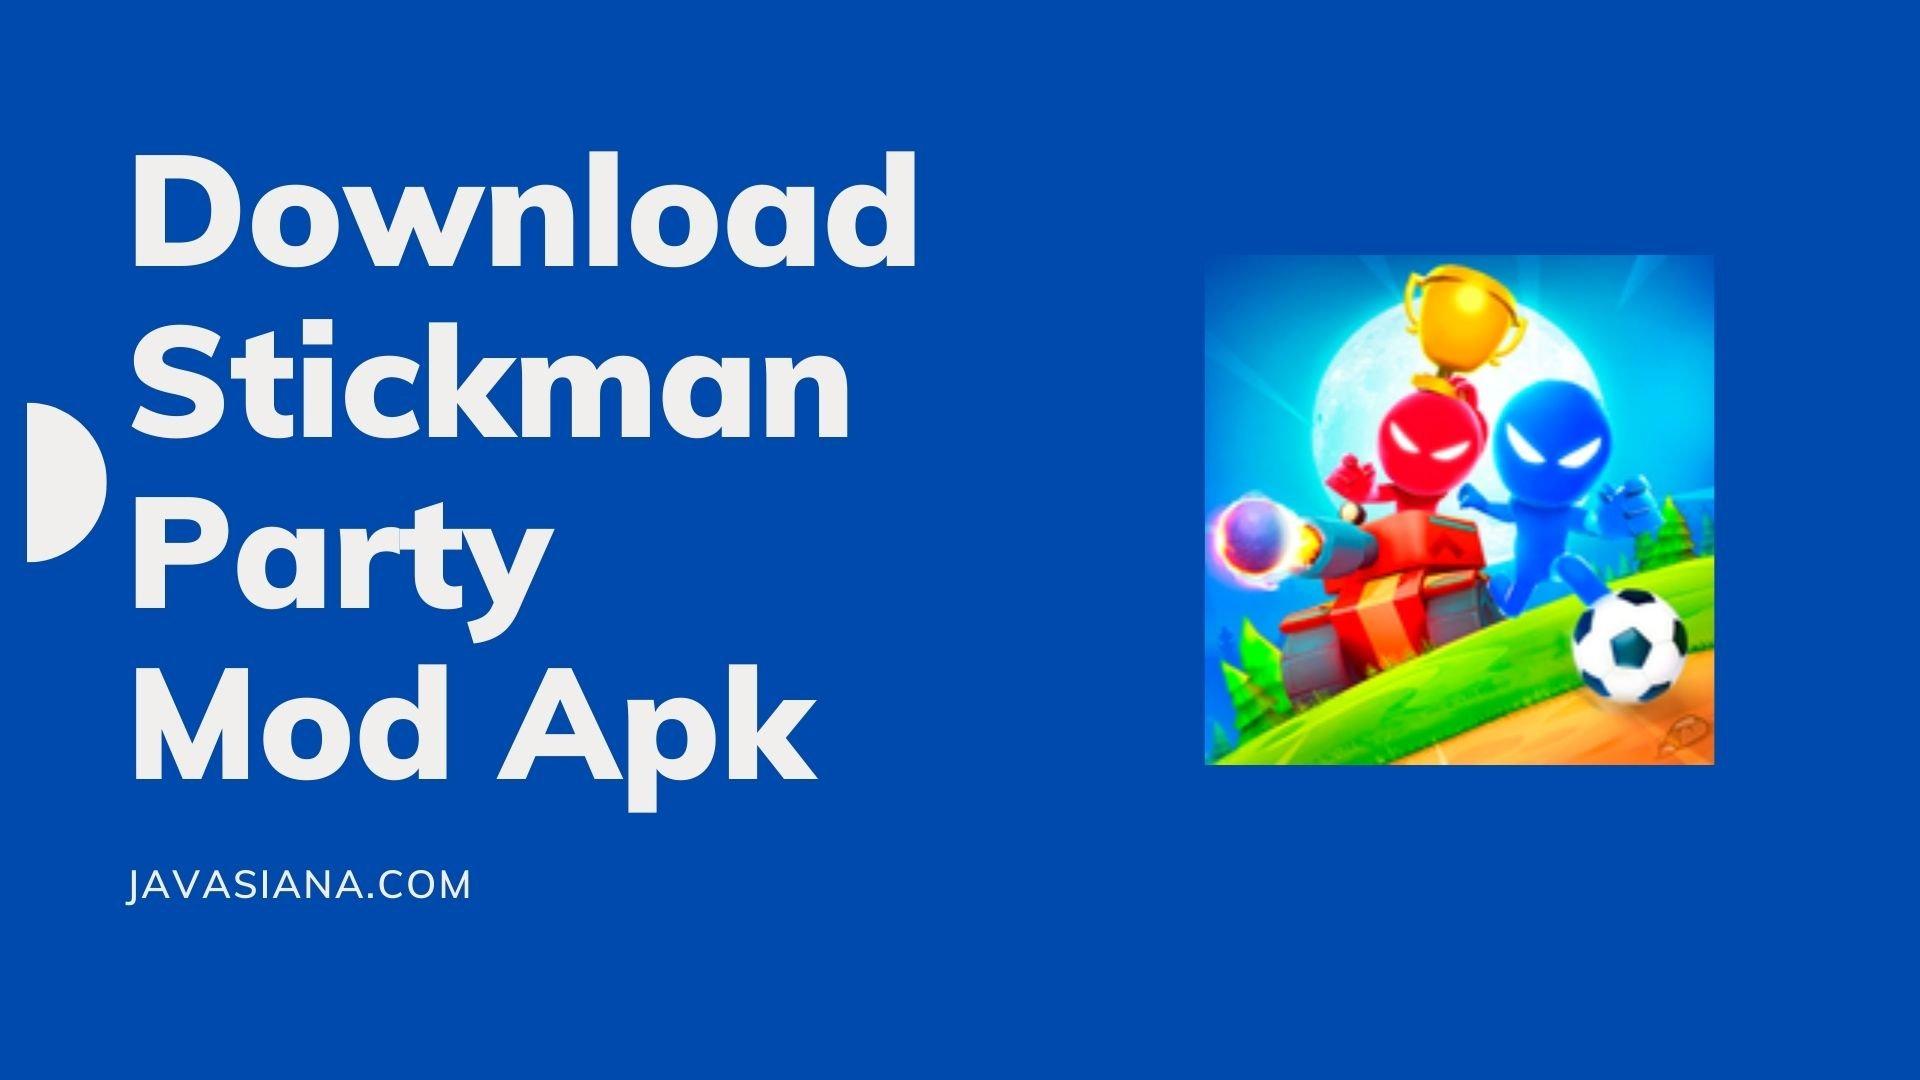 Stickman Party Mod Apk